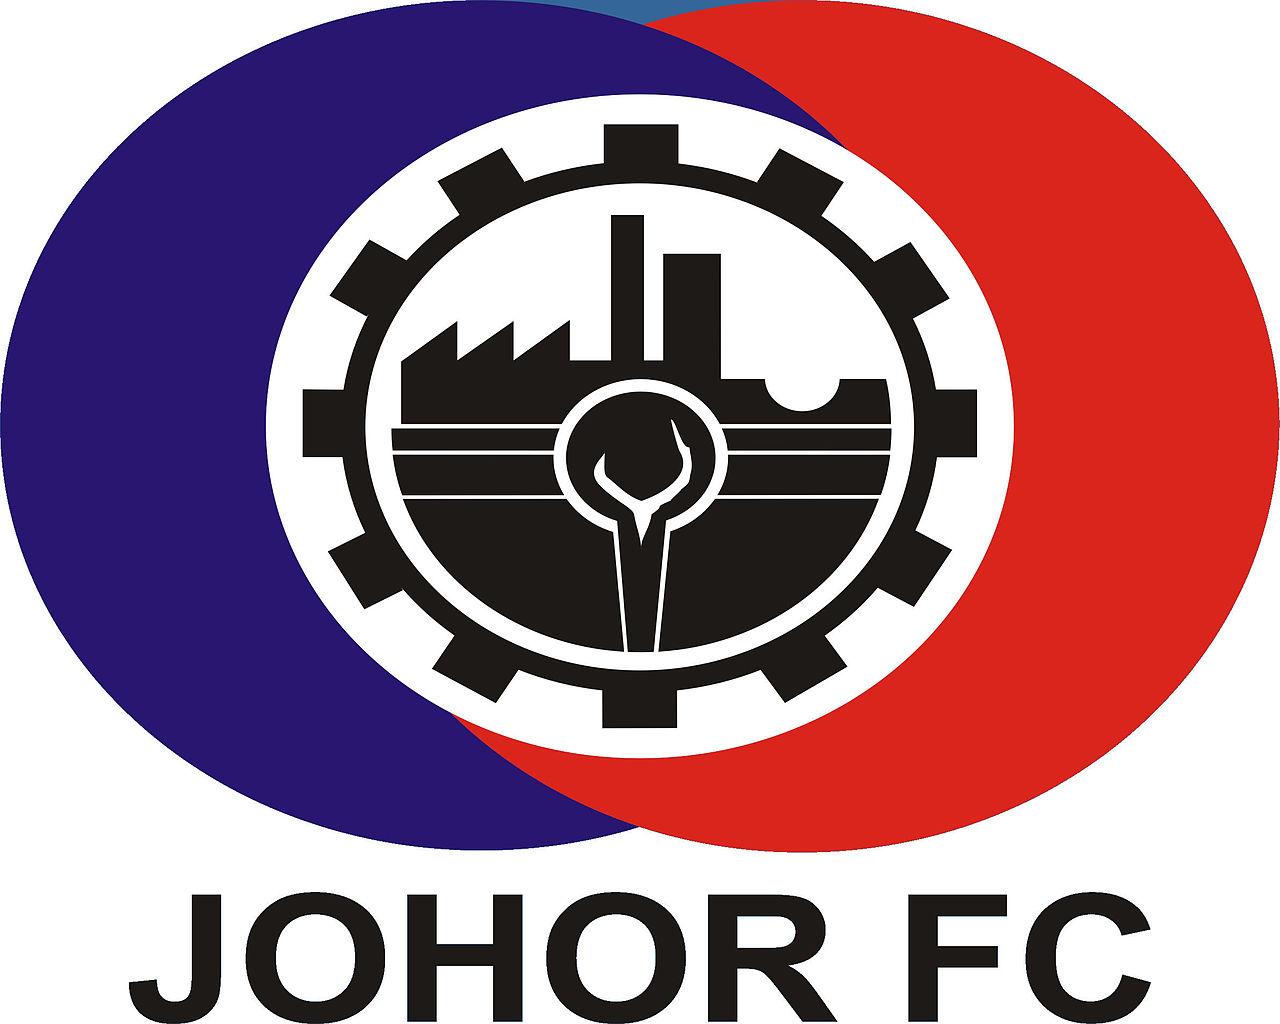 Johor Bahru Wikipedia Bahasa Indonesia Ensiklopedia Bebas